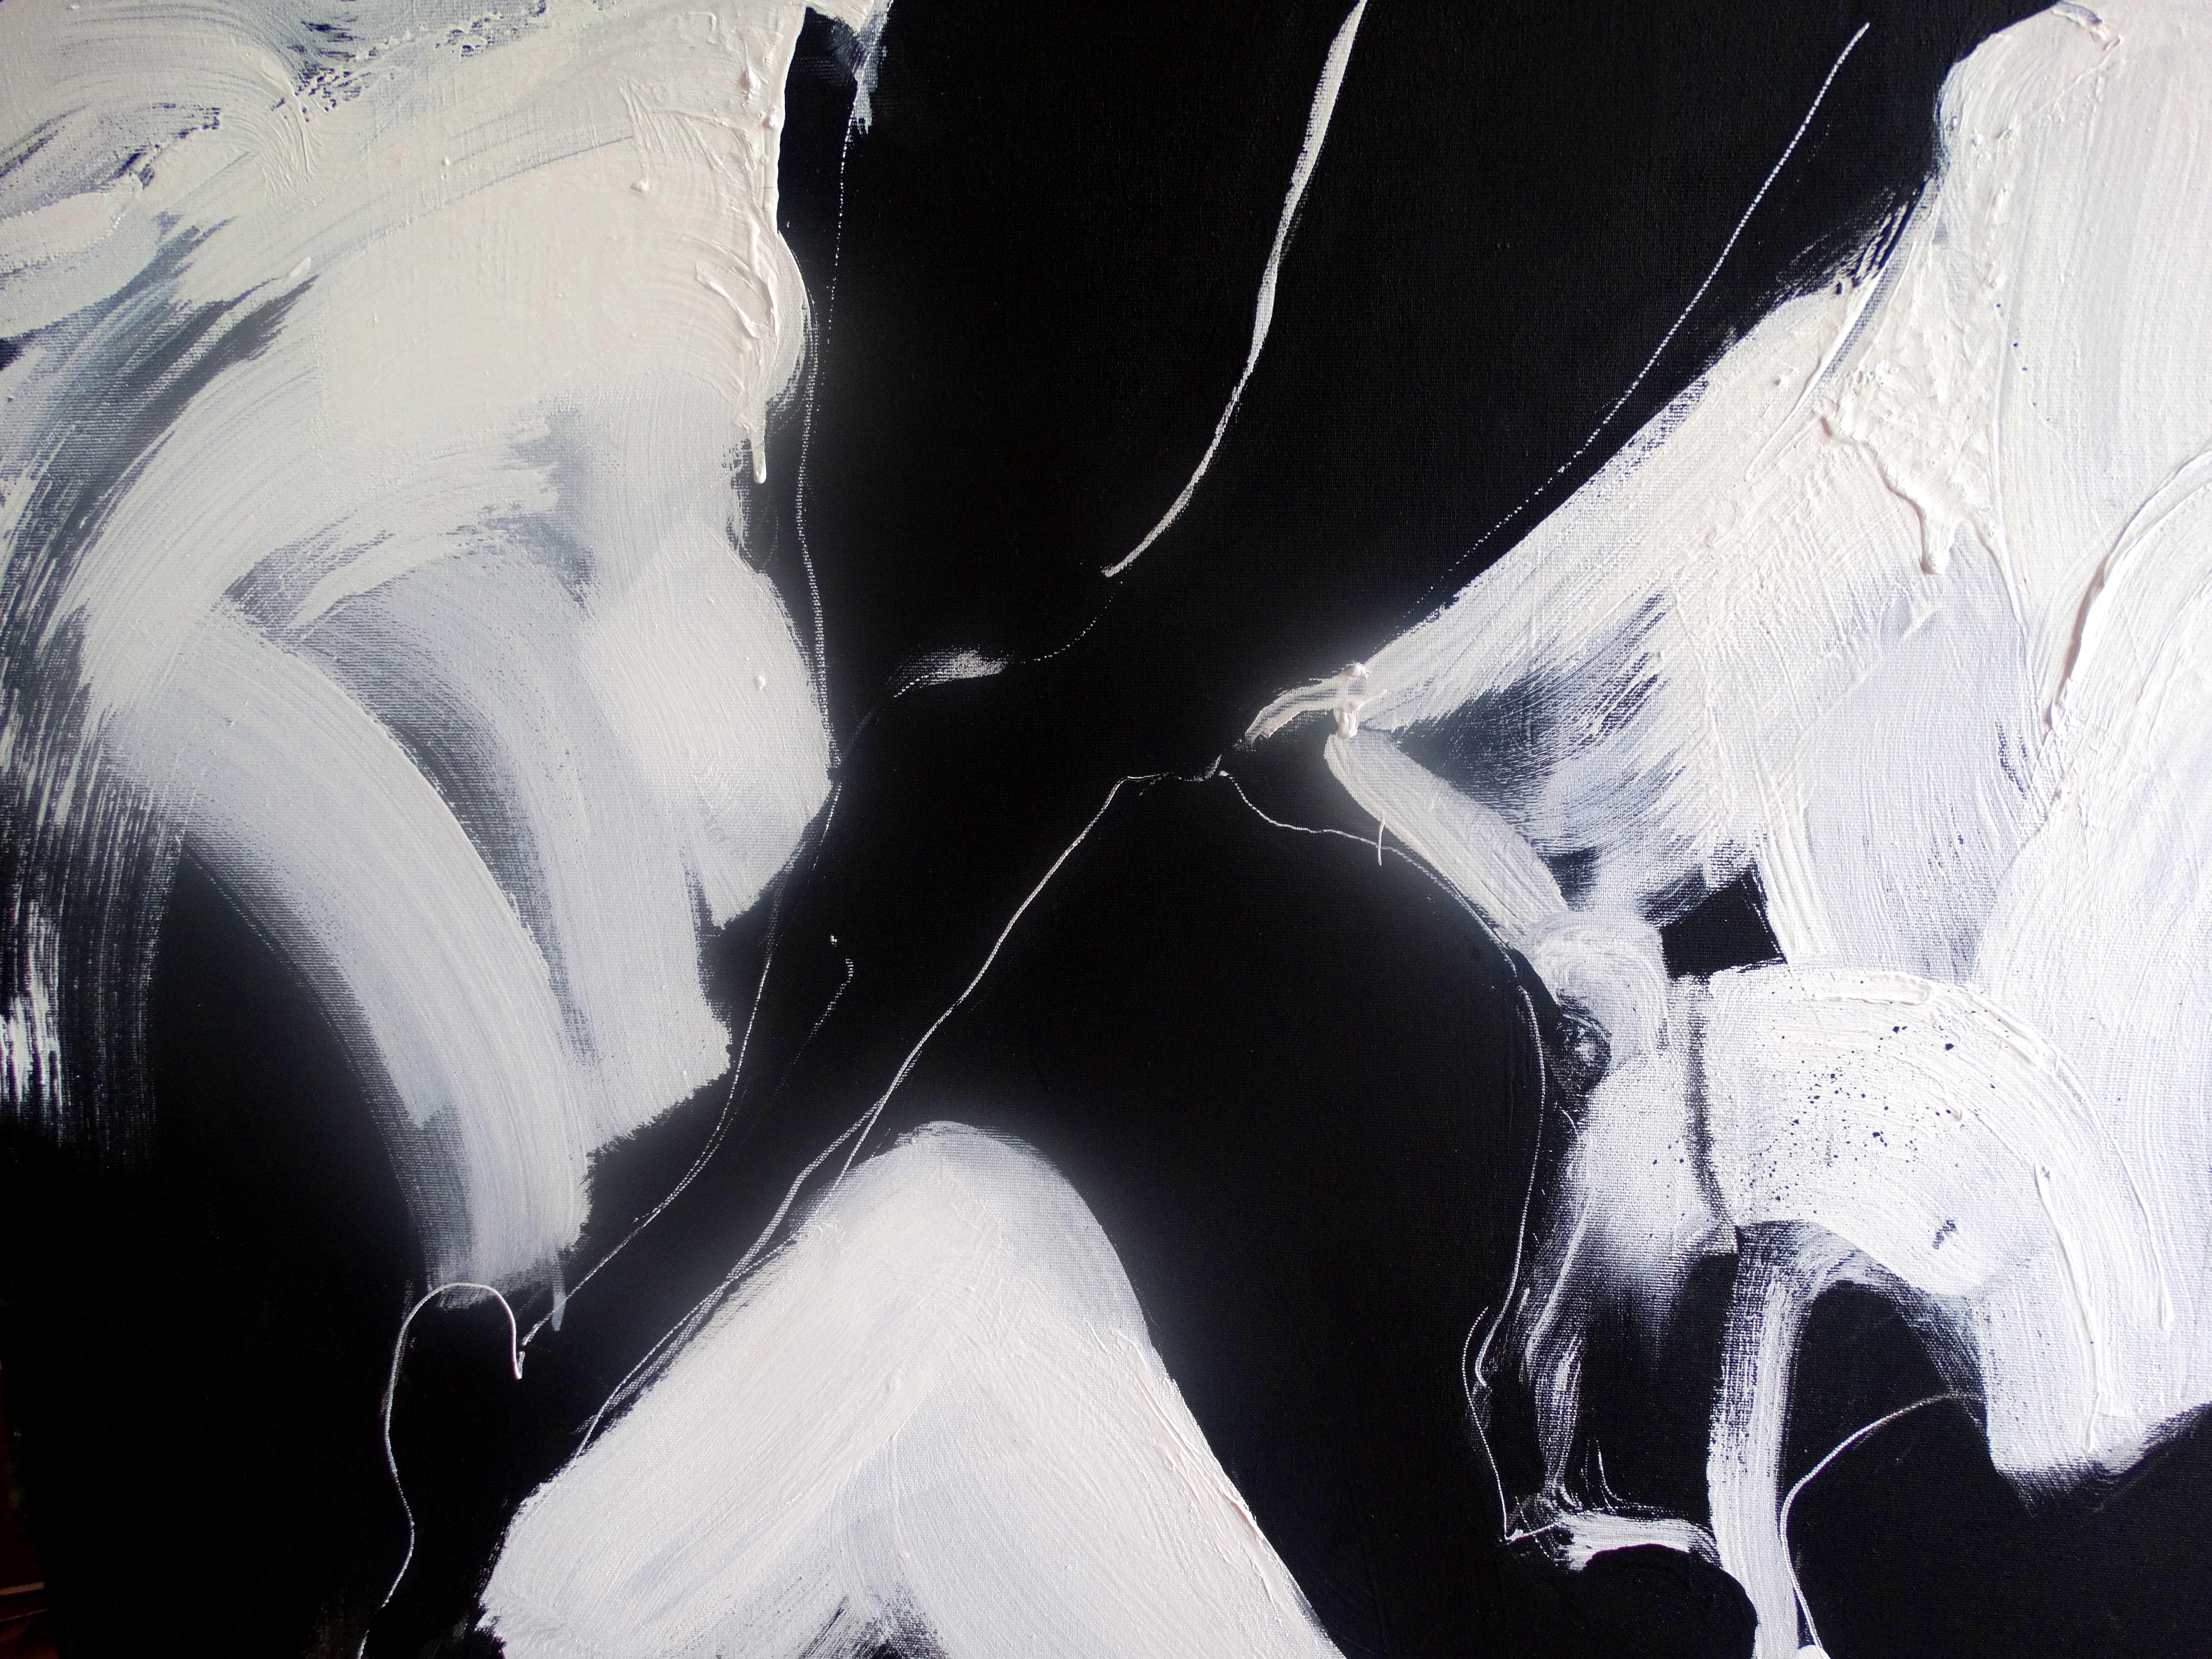 Solo exhibition by artist Ieva Caruka at the Rothko Centre